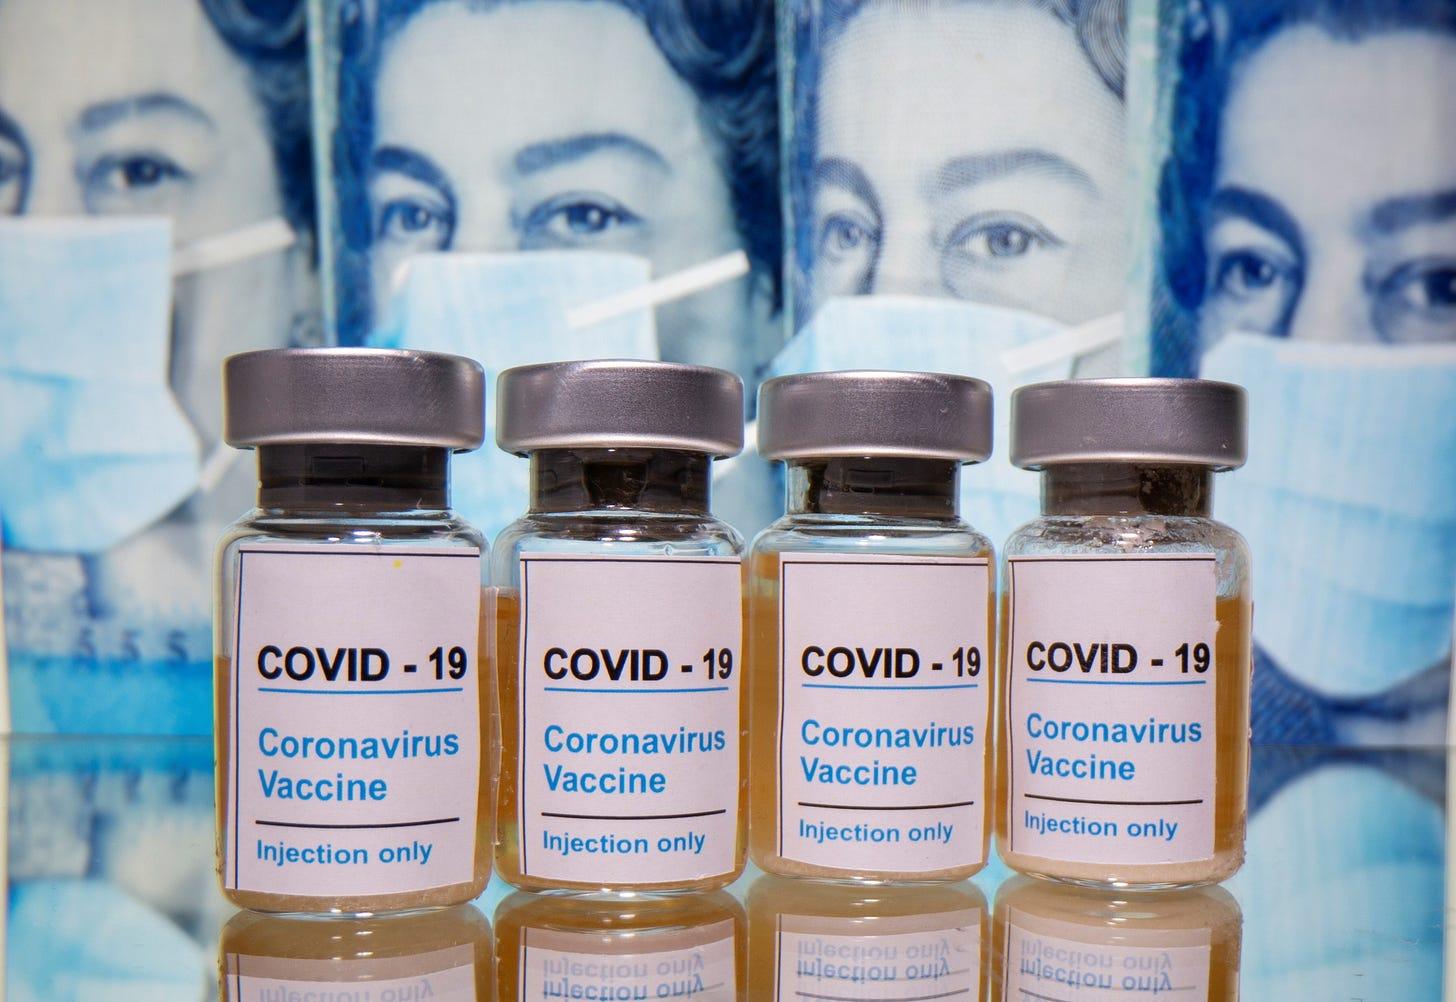 Pfizer announces COVID-19 vaccine over 90% effective | World Economic Forum